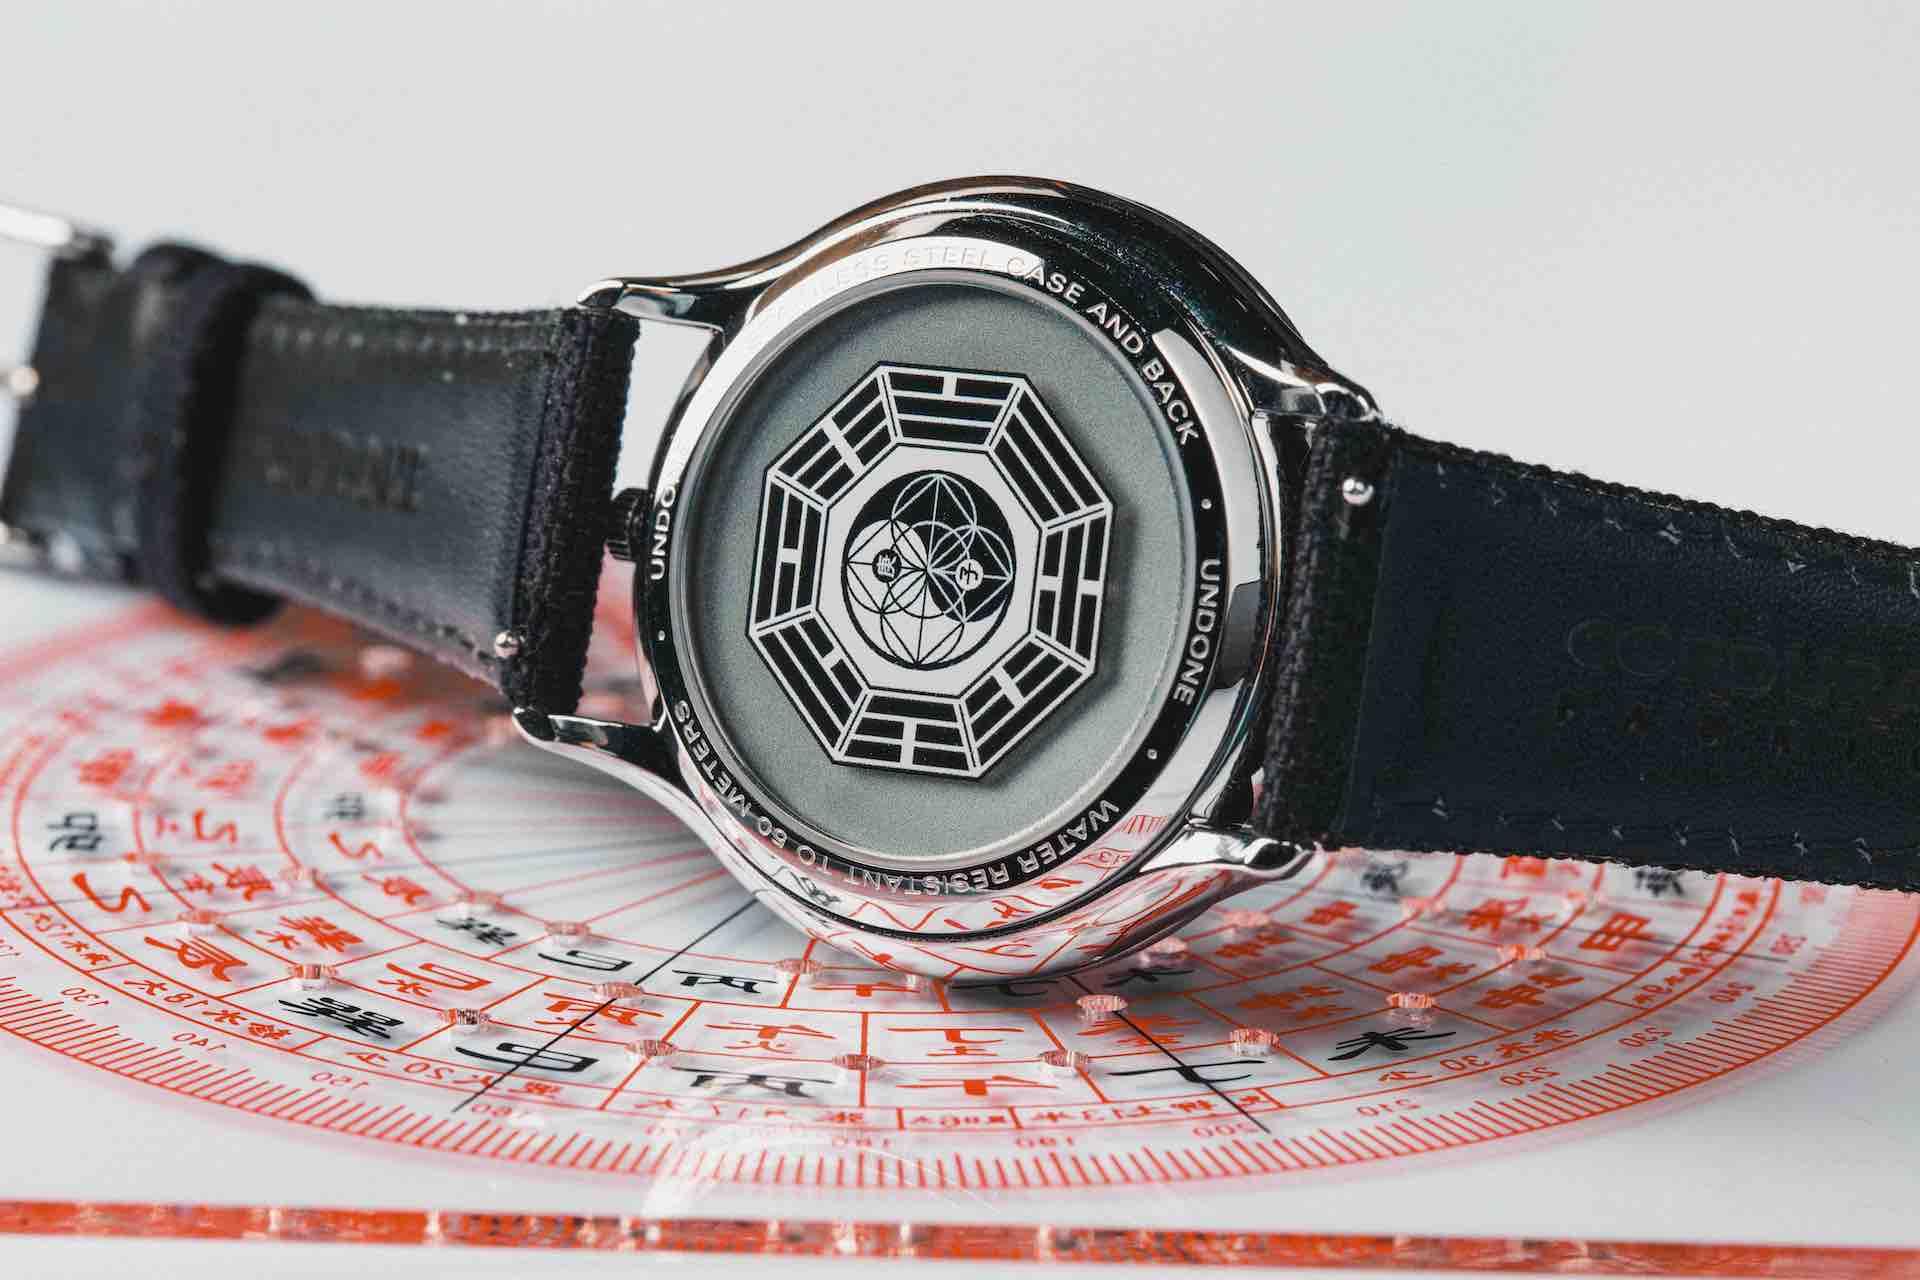 UNDONEから羅盤や風水コンパスを近代的にアレンジした腕時計が登場!ケースバックには十干十二支がプリント lf200623_undone_zen_03